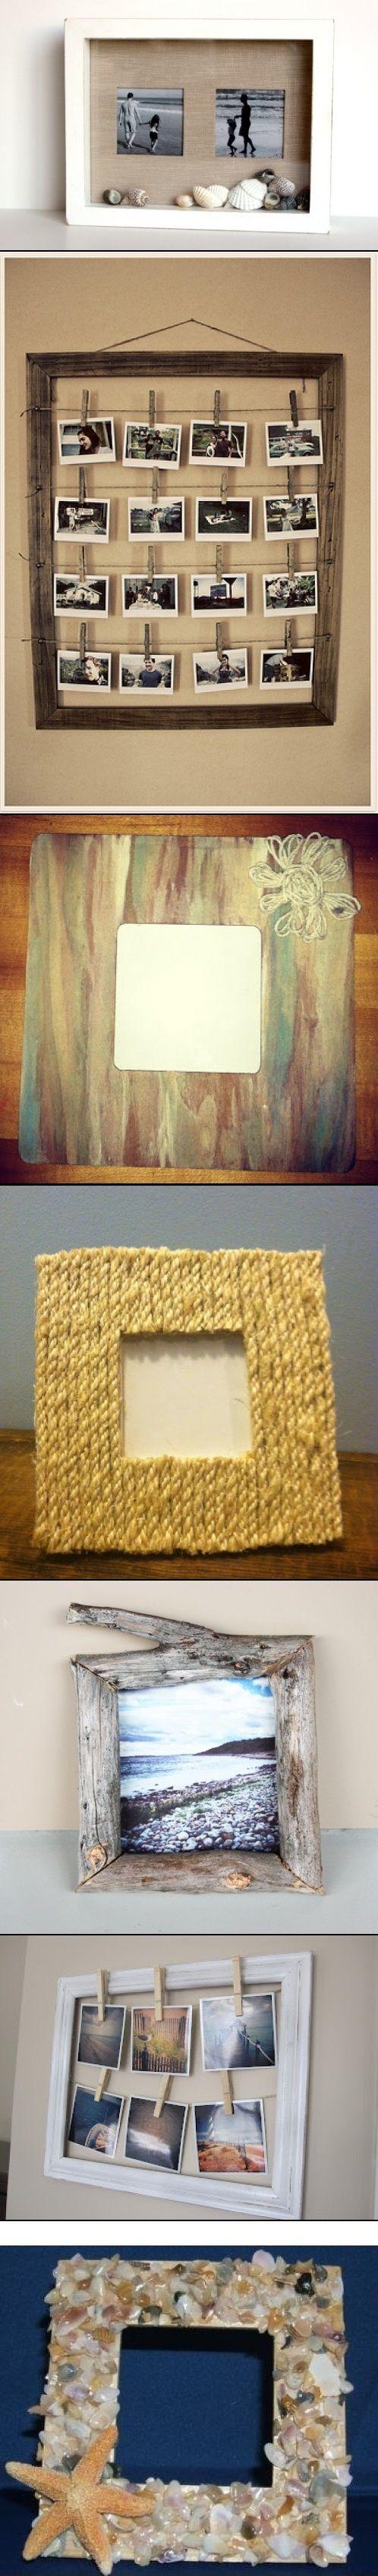 DIY Photo Frames ideas